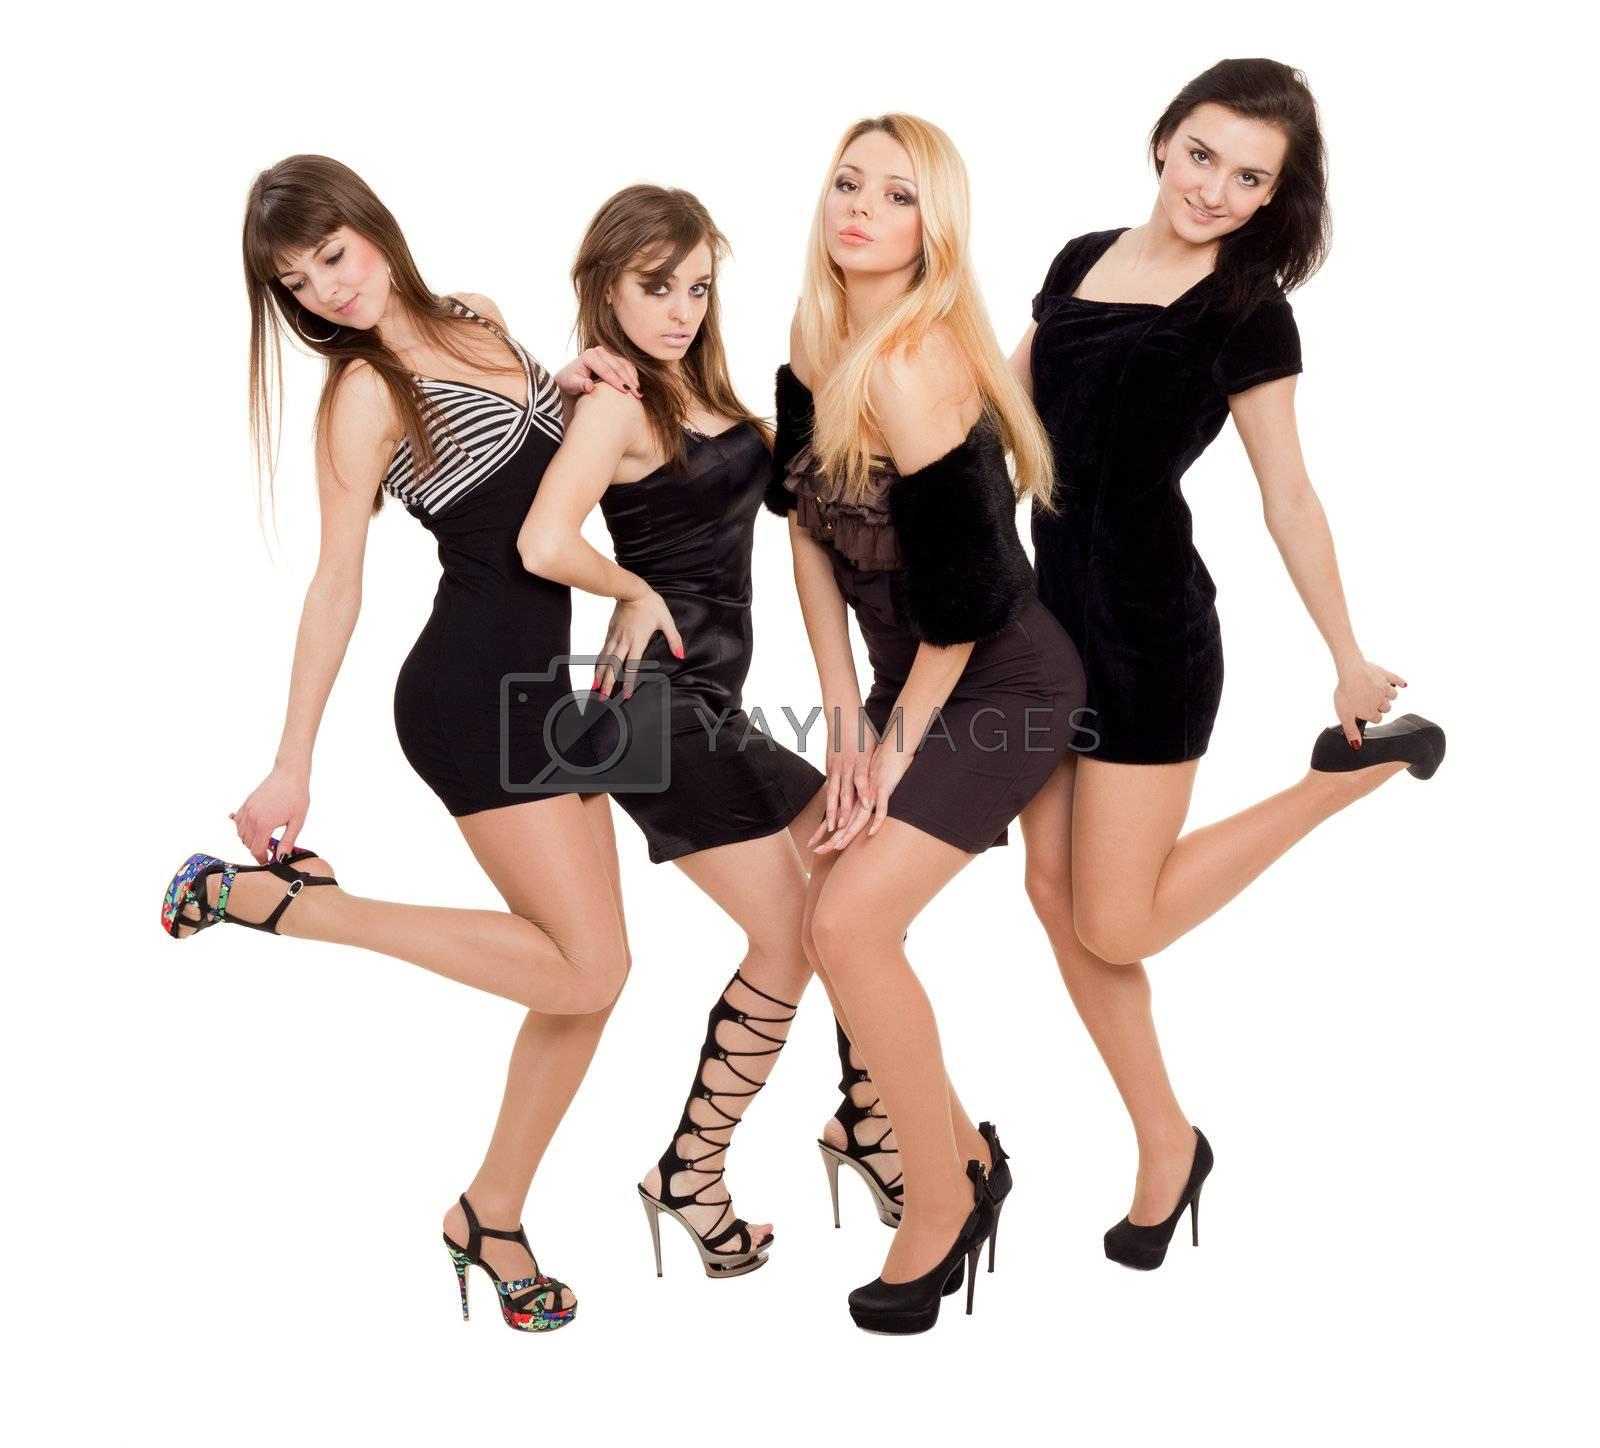 Fashion ladies by Igor Stramyk